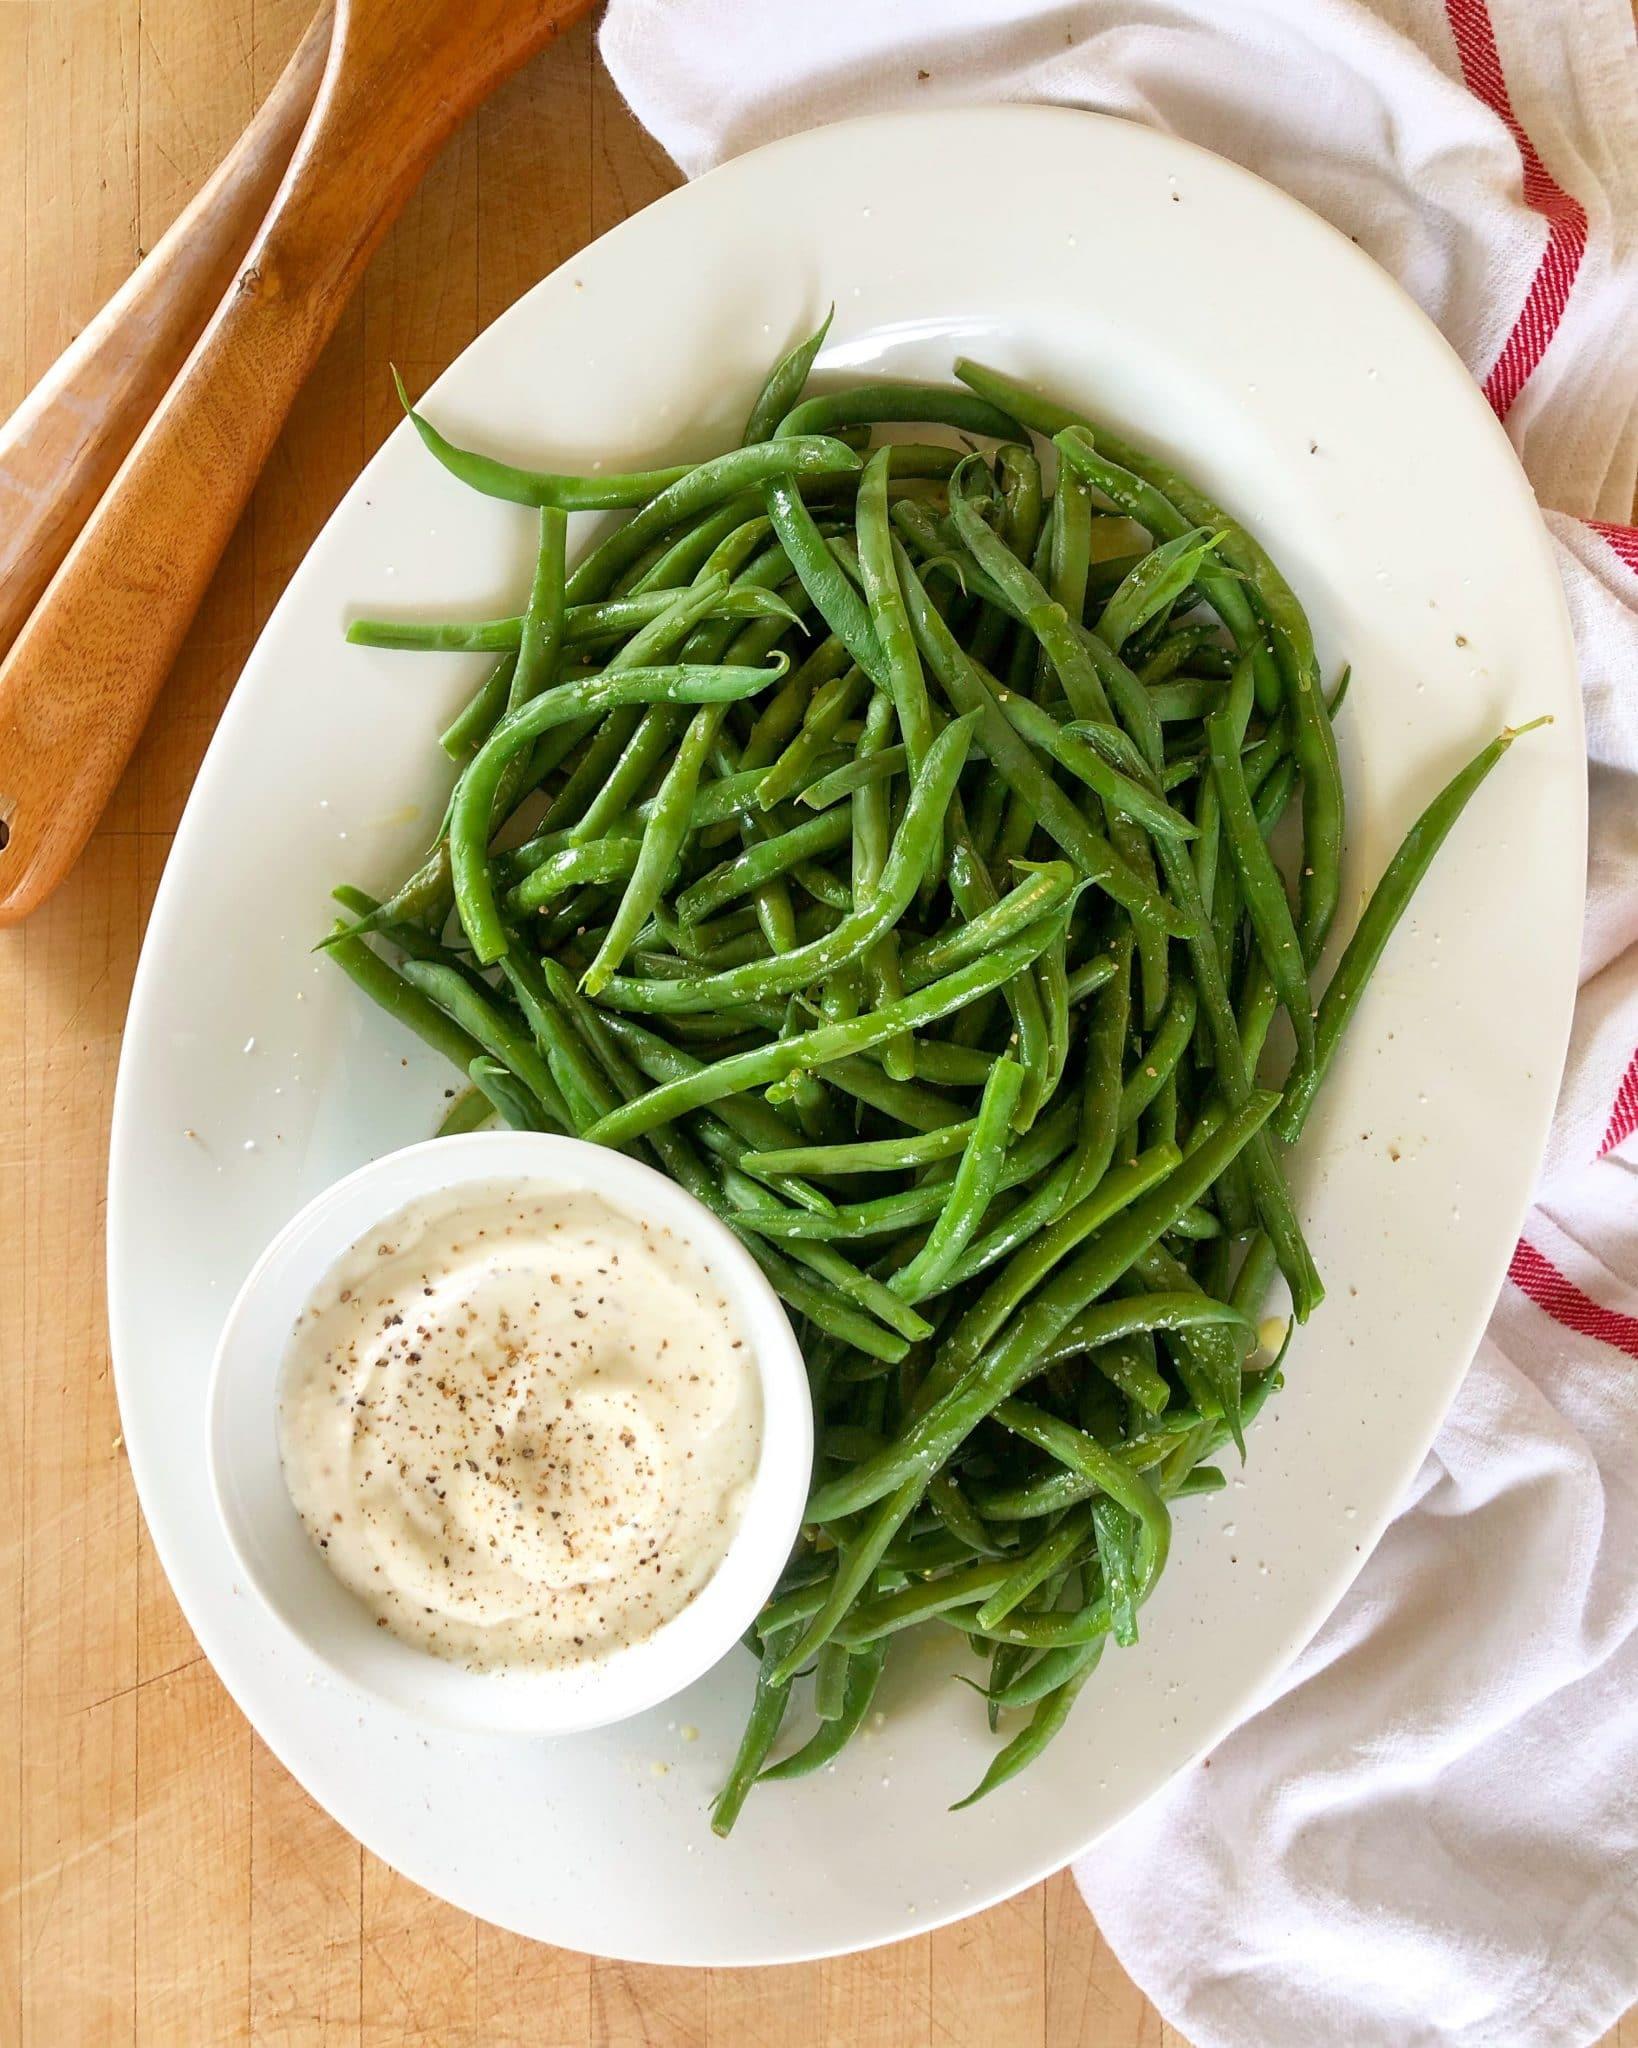 Easy creamy horseradish sauce